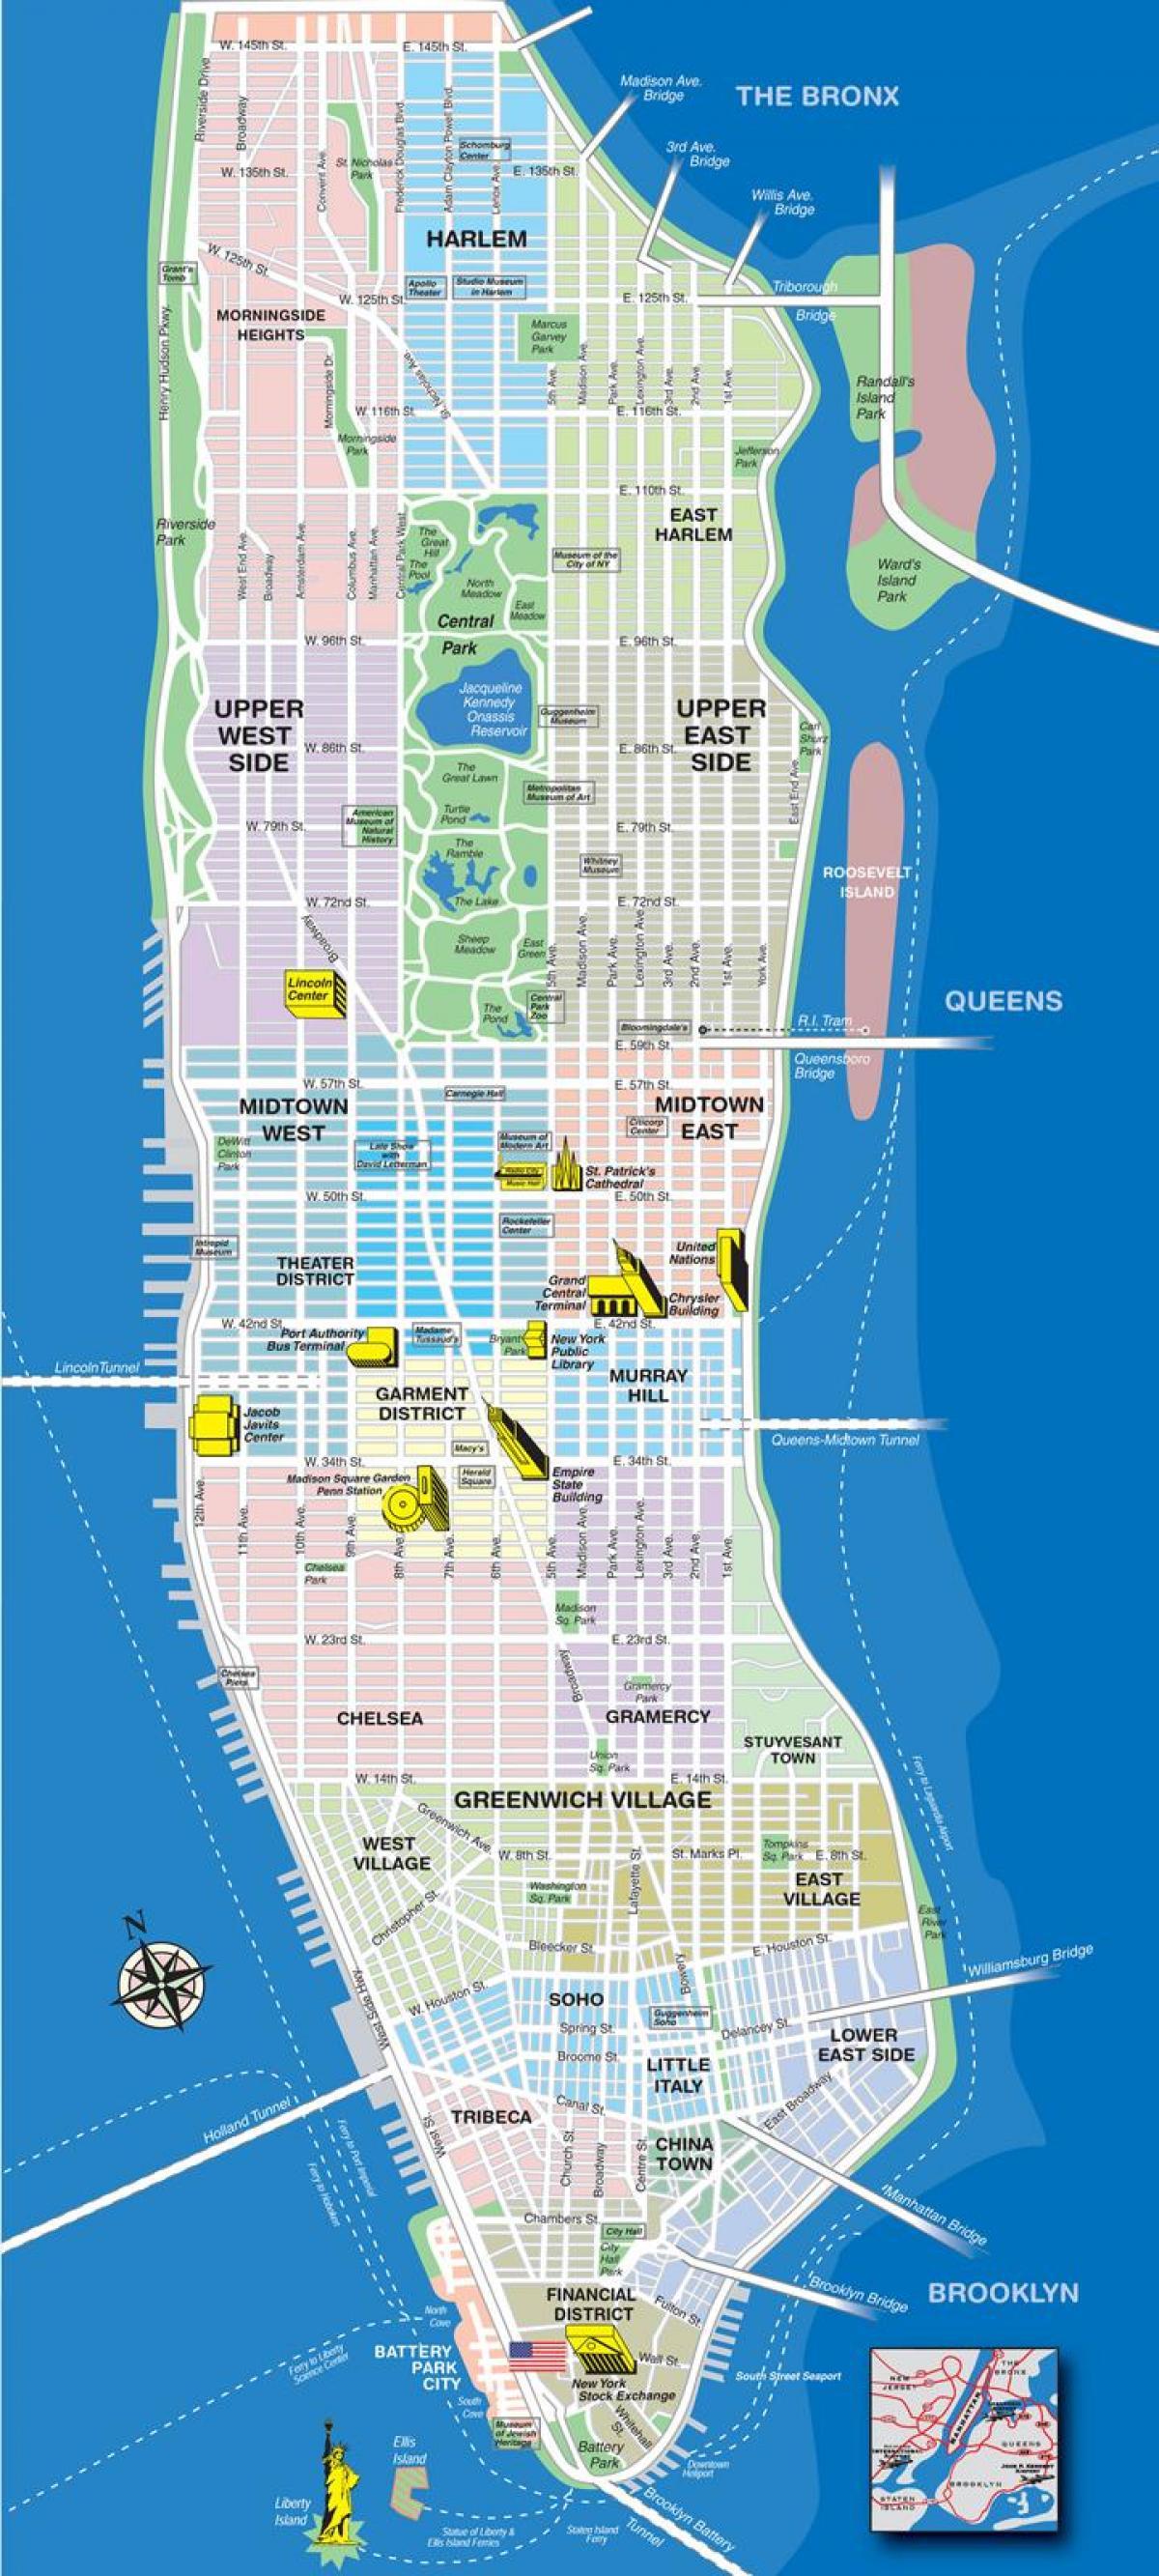 Map Of New York Neighborhoods Manhattan.Map Of Manhattan Neighborhoods With Streets Map Of Upper Manhattan